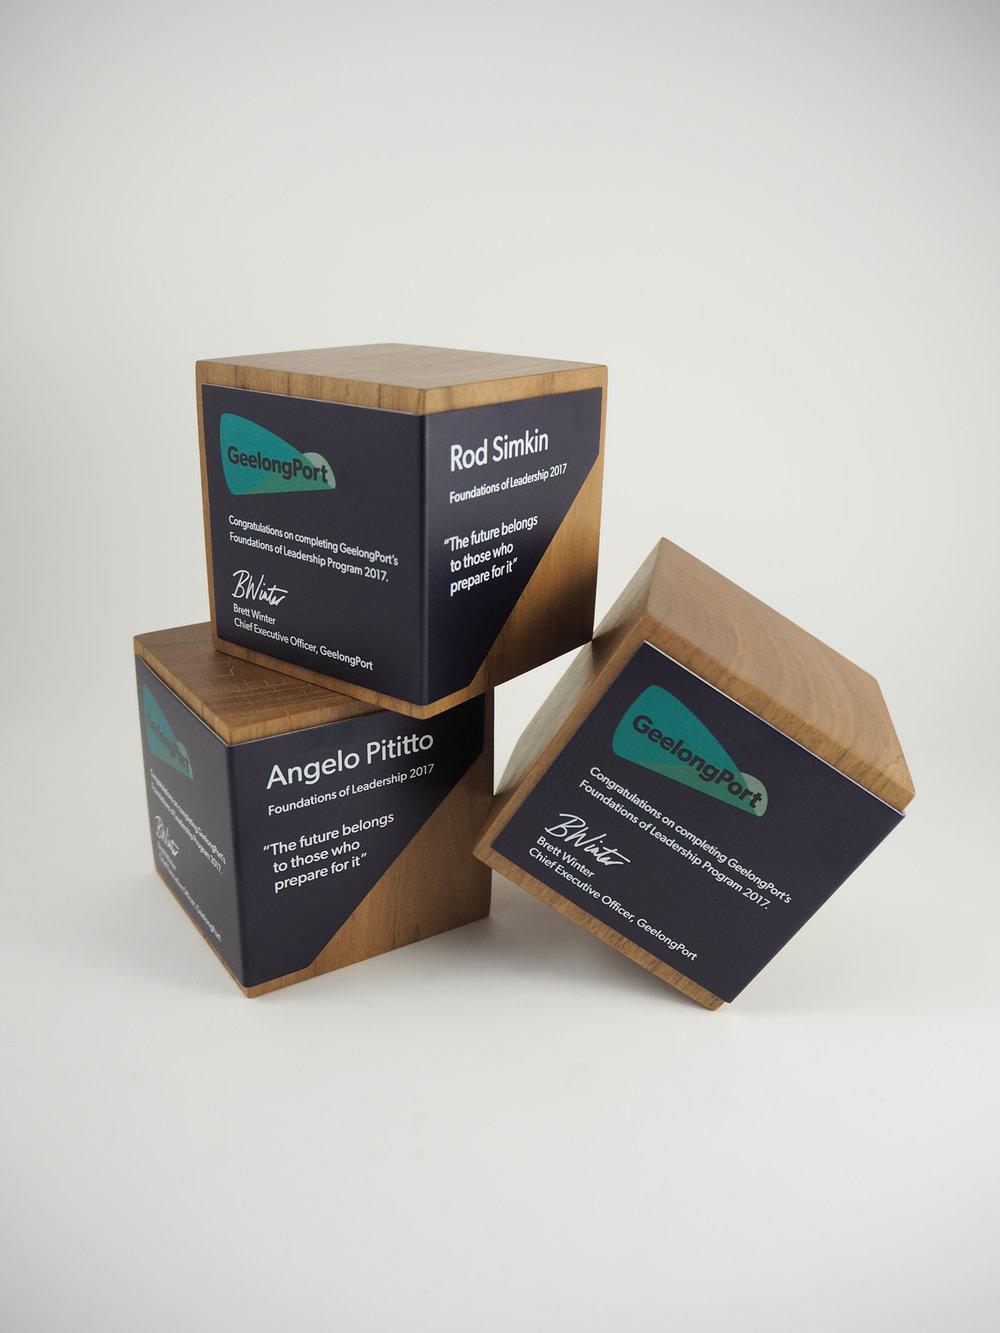 geelong-port-awards-reclaimed-timber-eco-aluminium-trophy-01.jpg